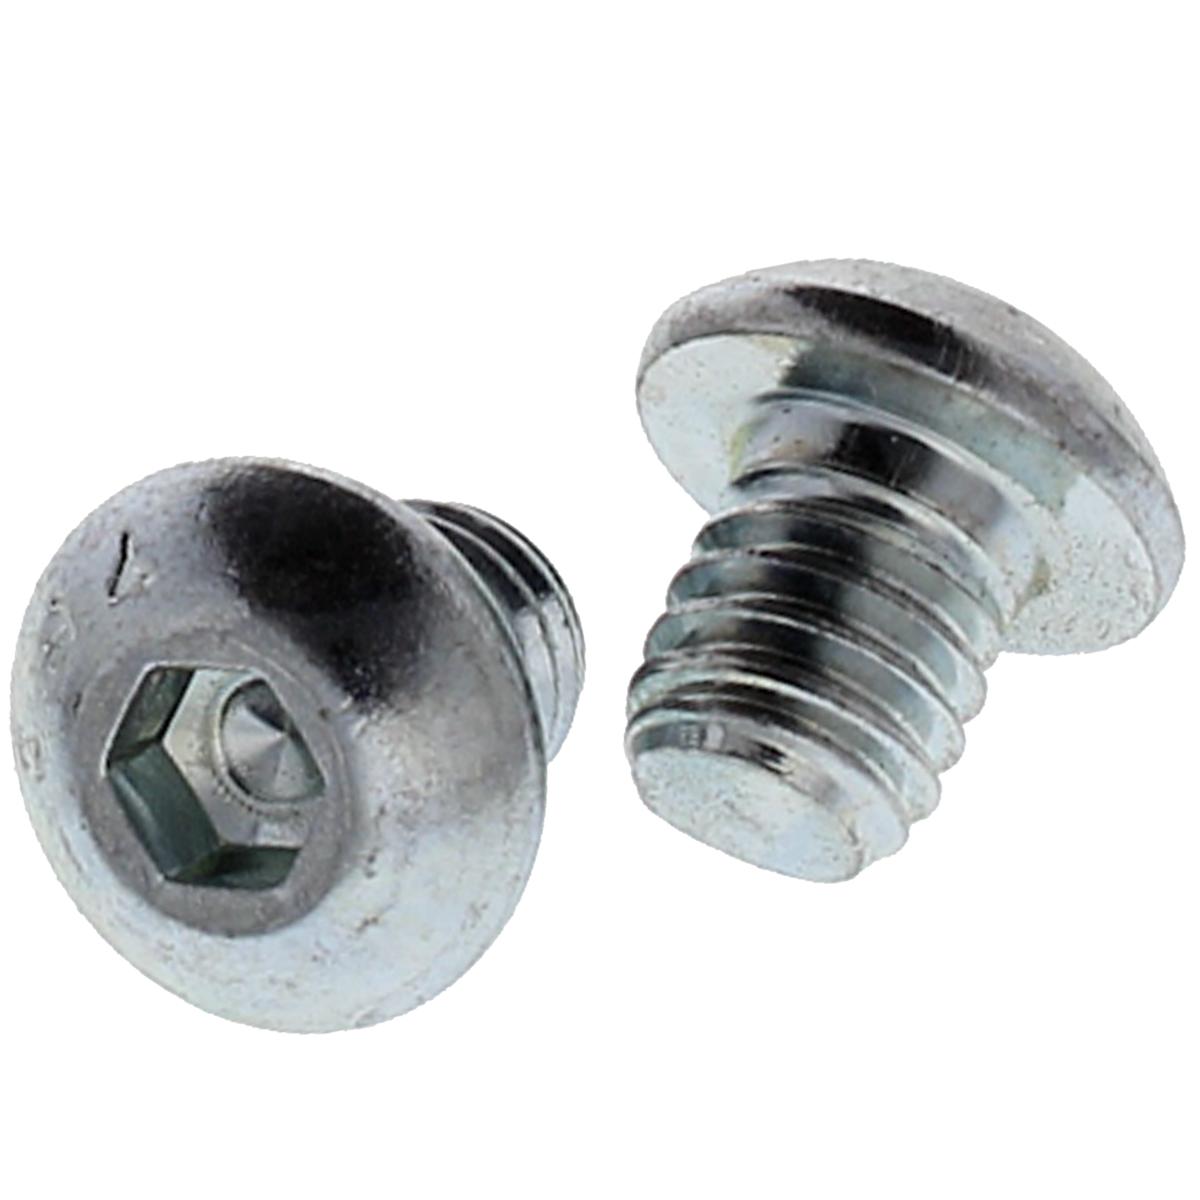 "#10-24 x 1-1/4"" Button Head Socket Cap Screws — Alloy Steel Heat Treated, Coarse, Zinc, 100/PKG"